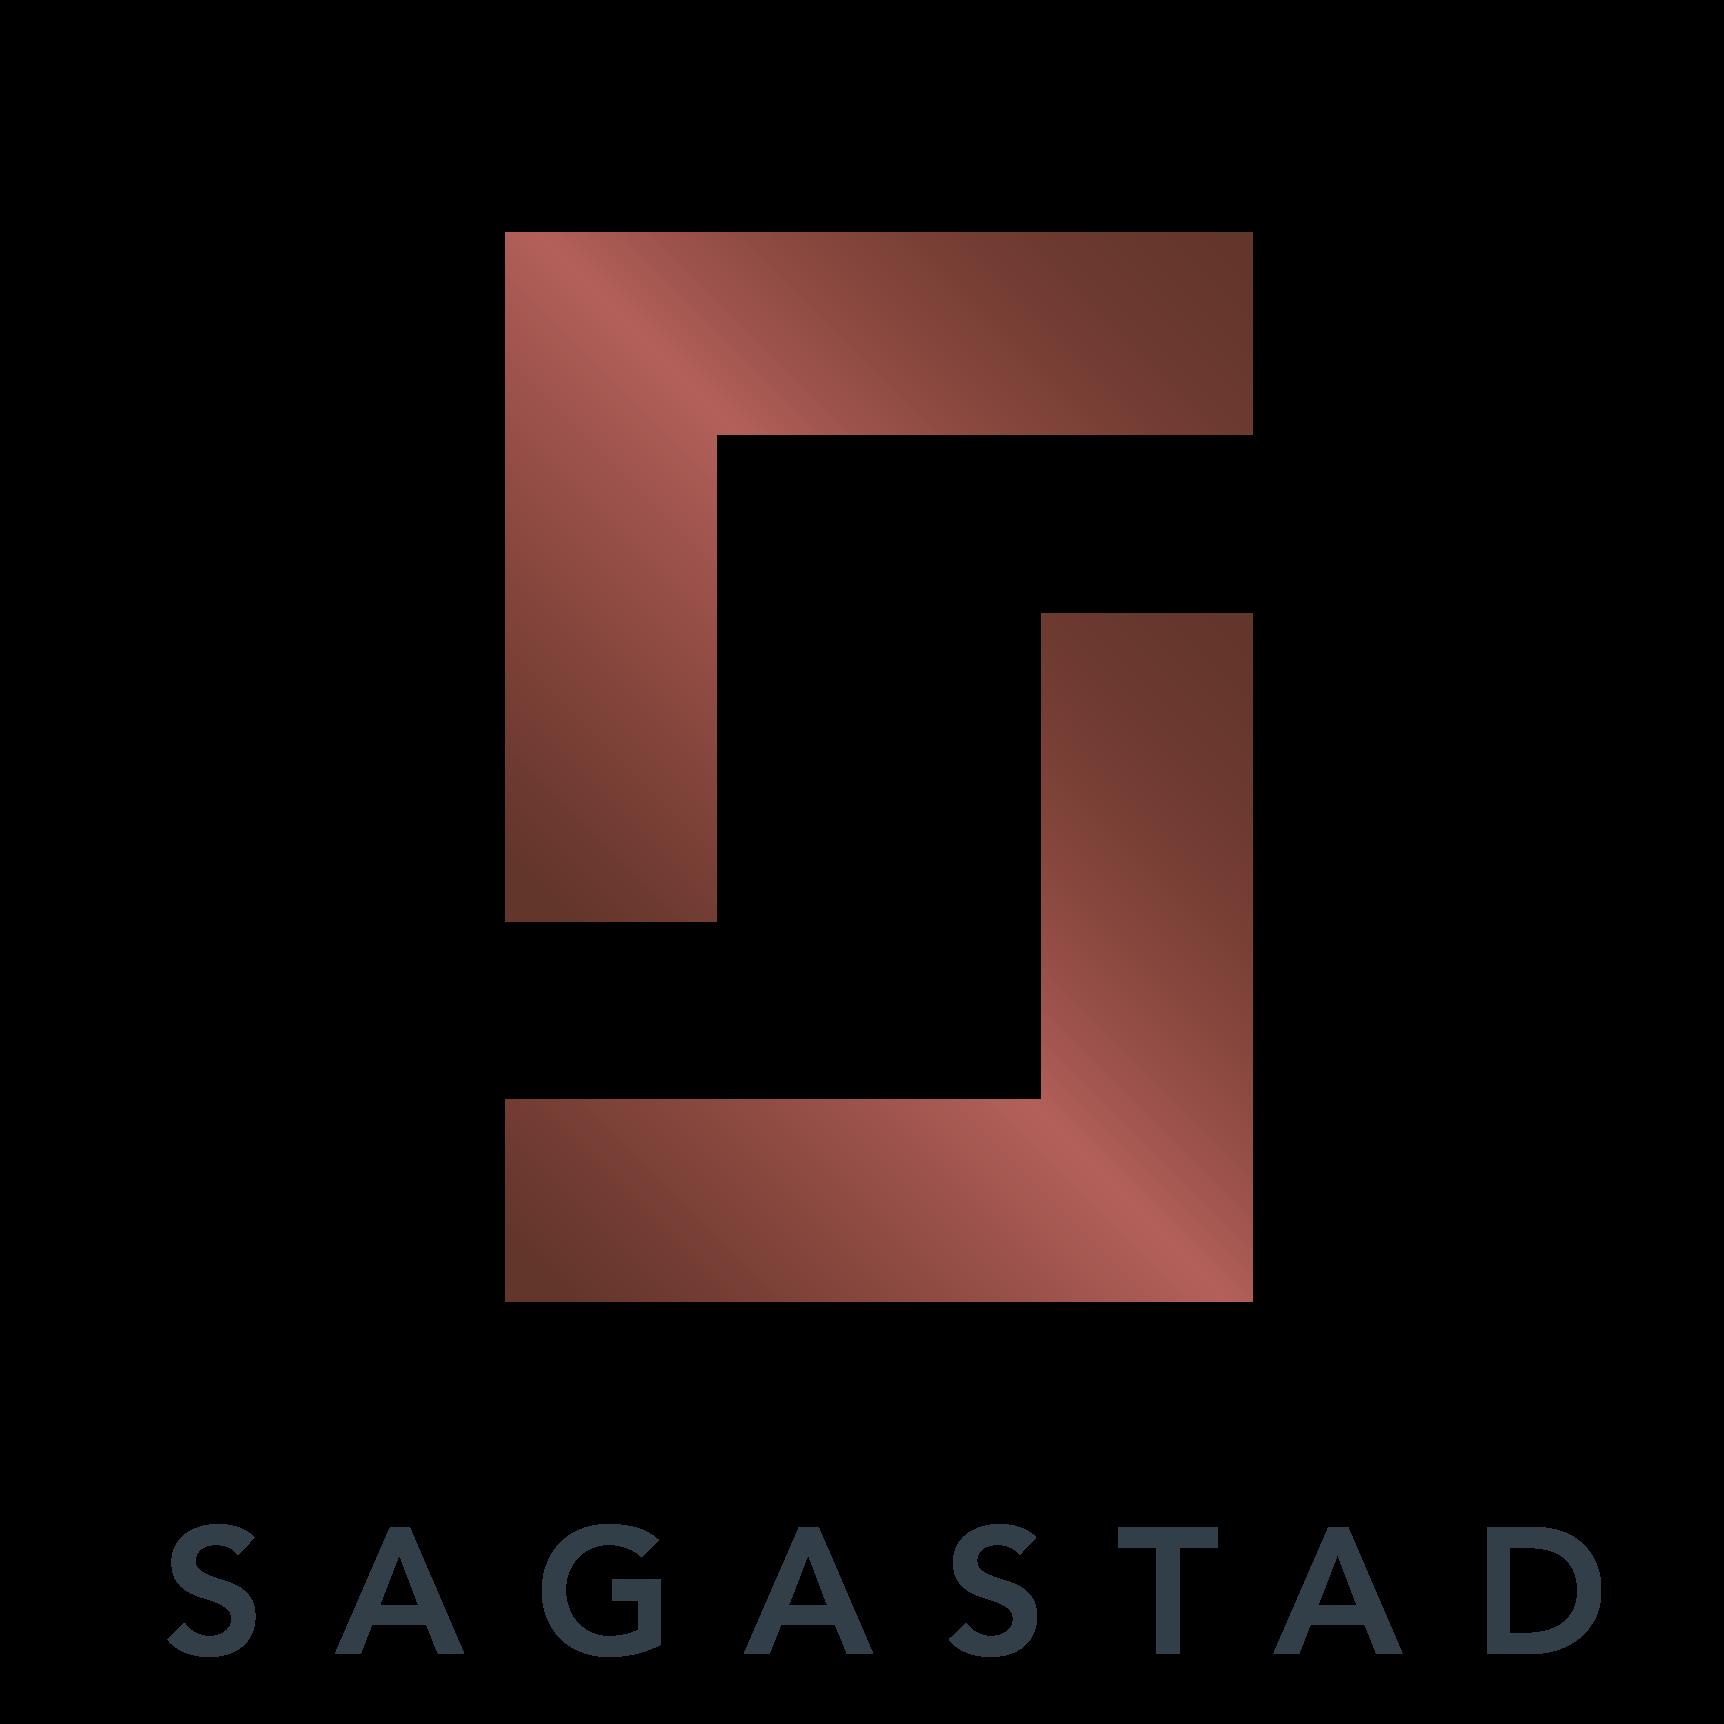 Sagastad Exibition